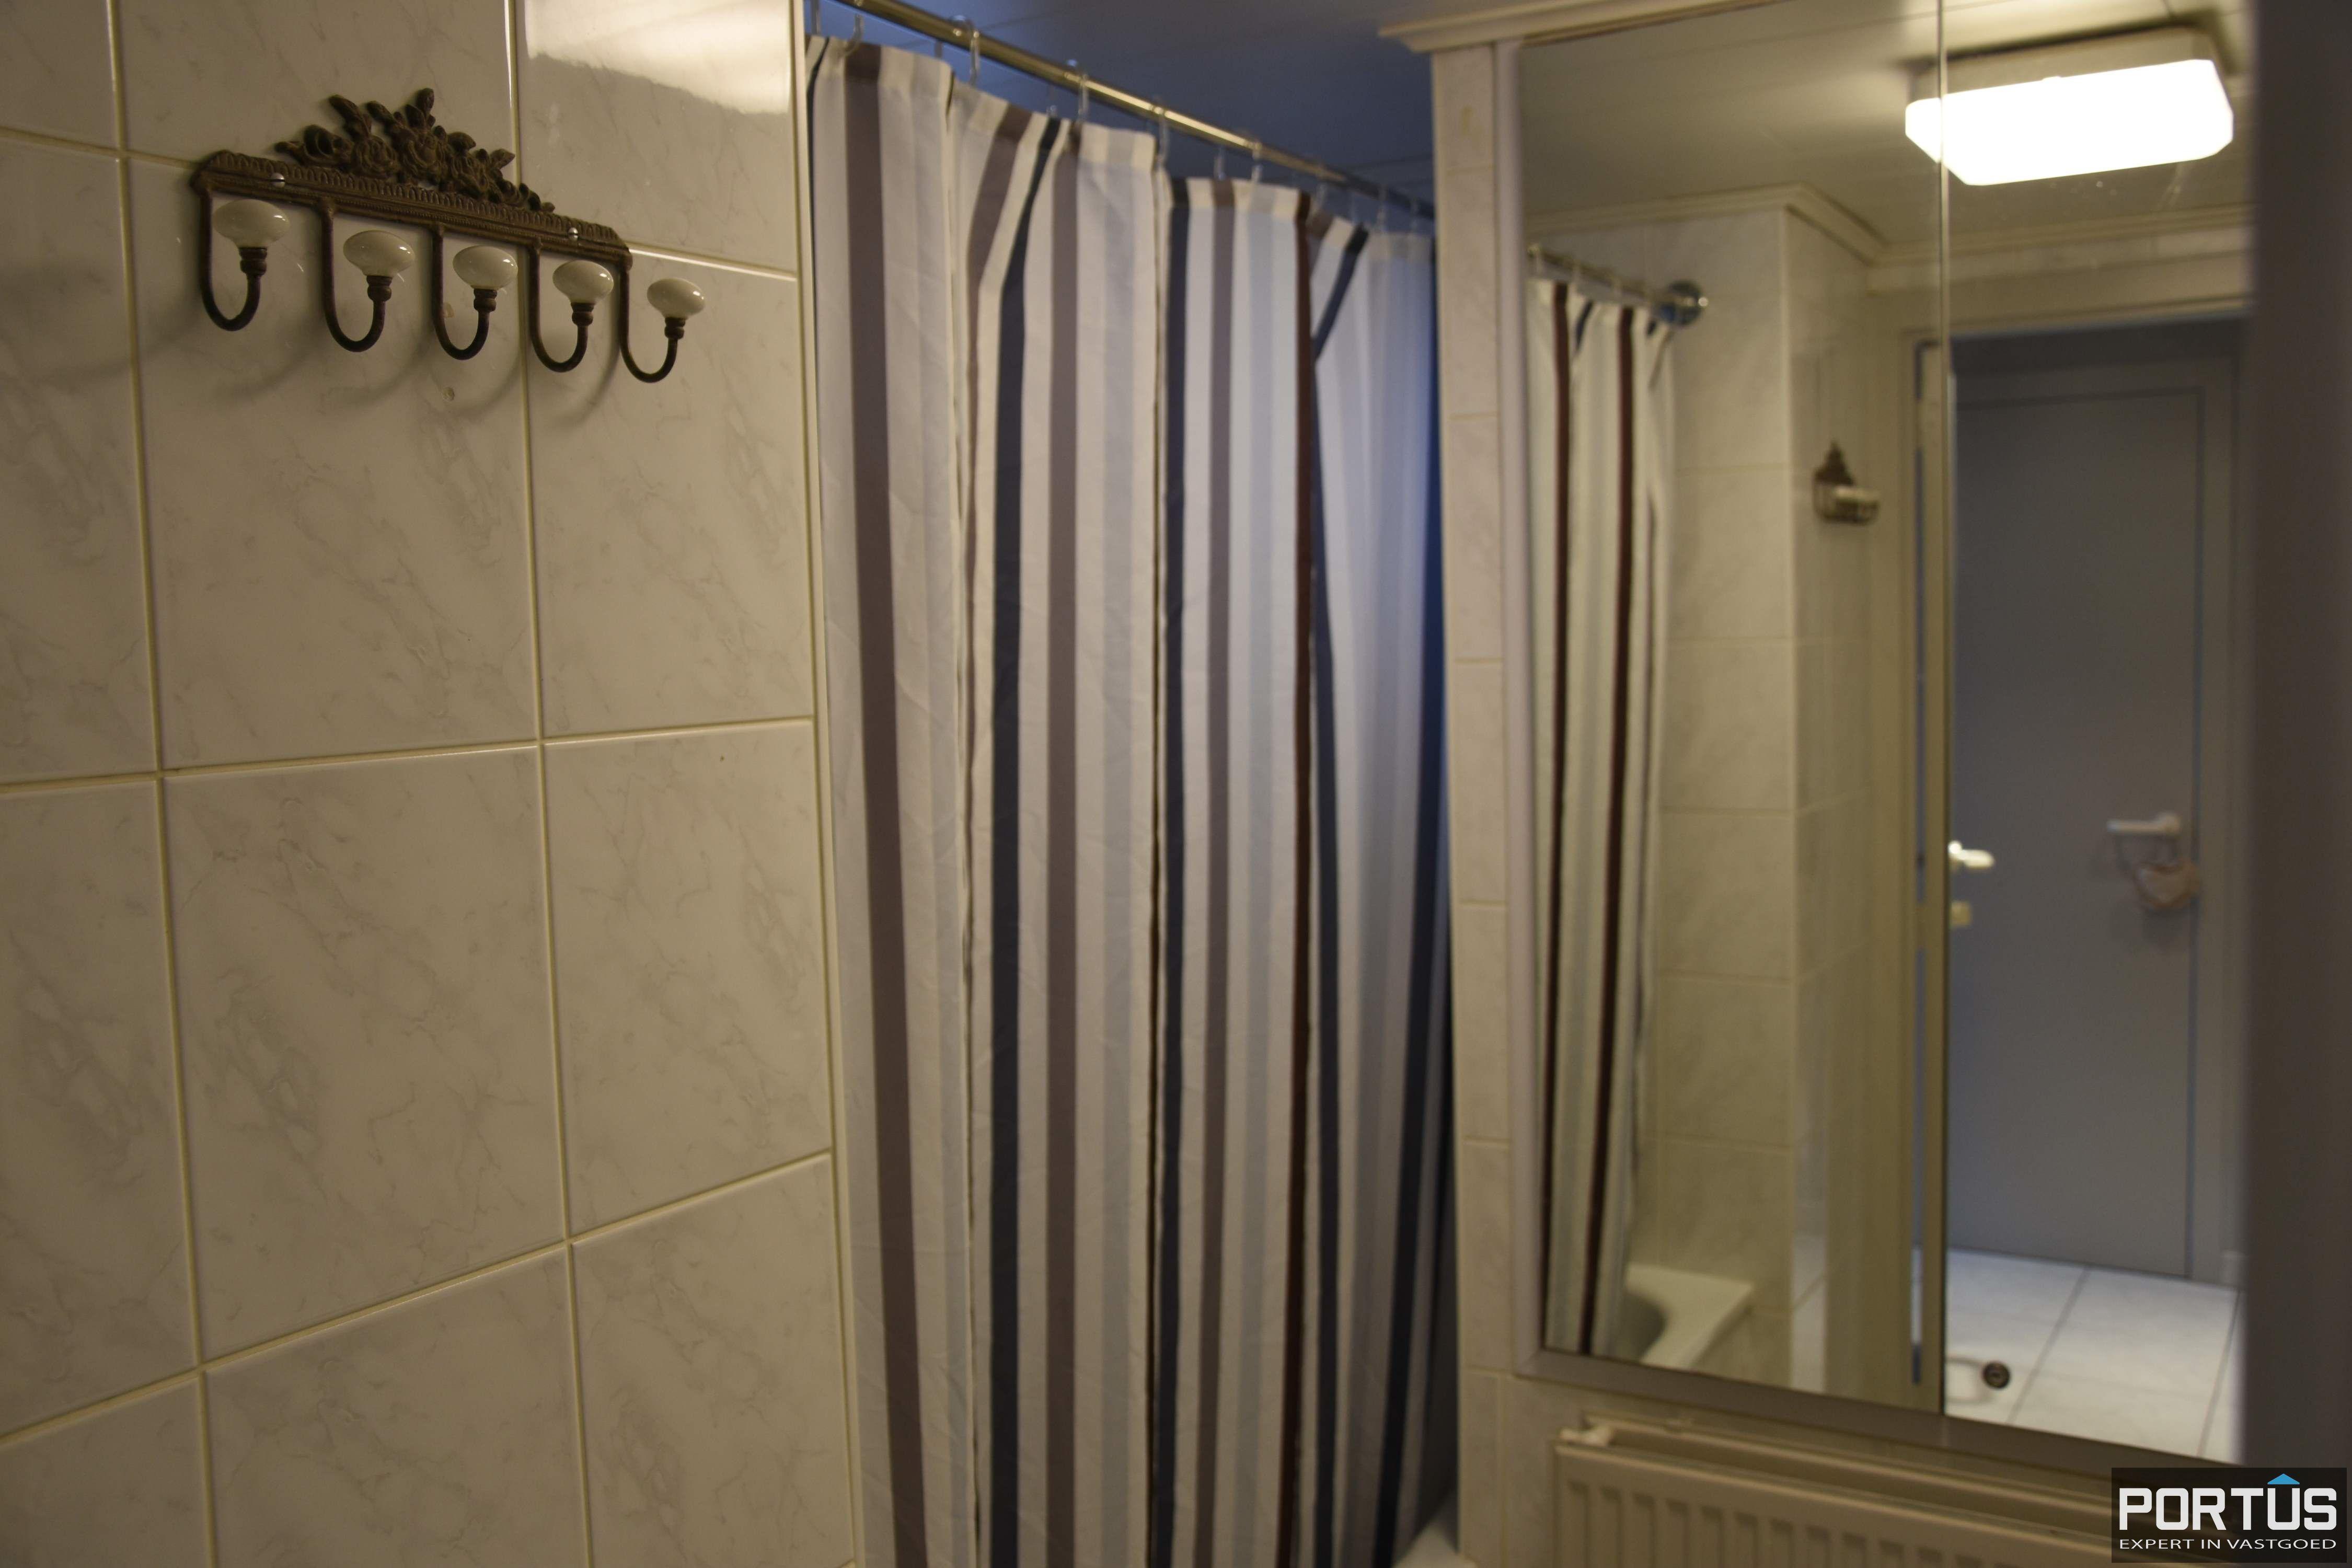 Instapklare woning met 2 slaapkamers - 8946